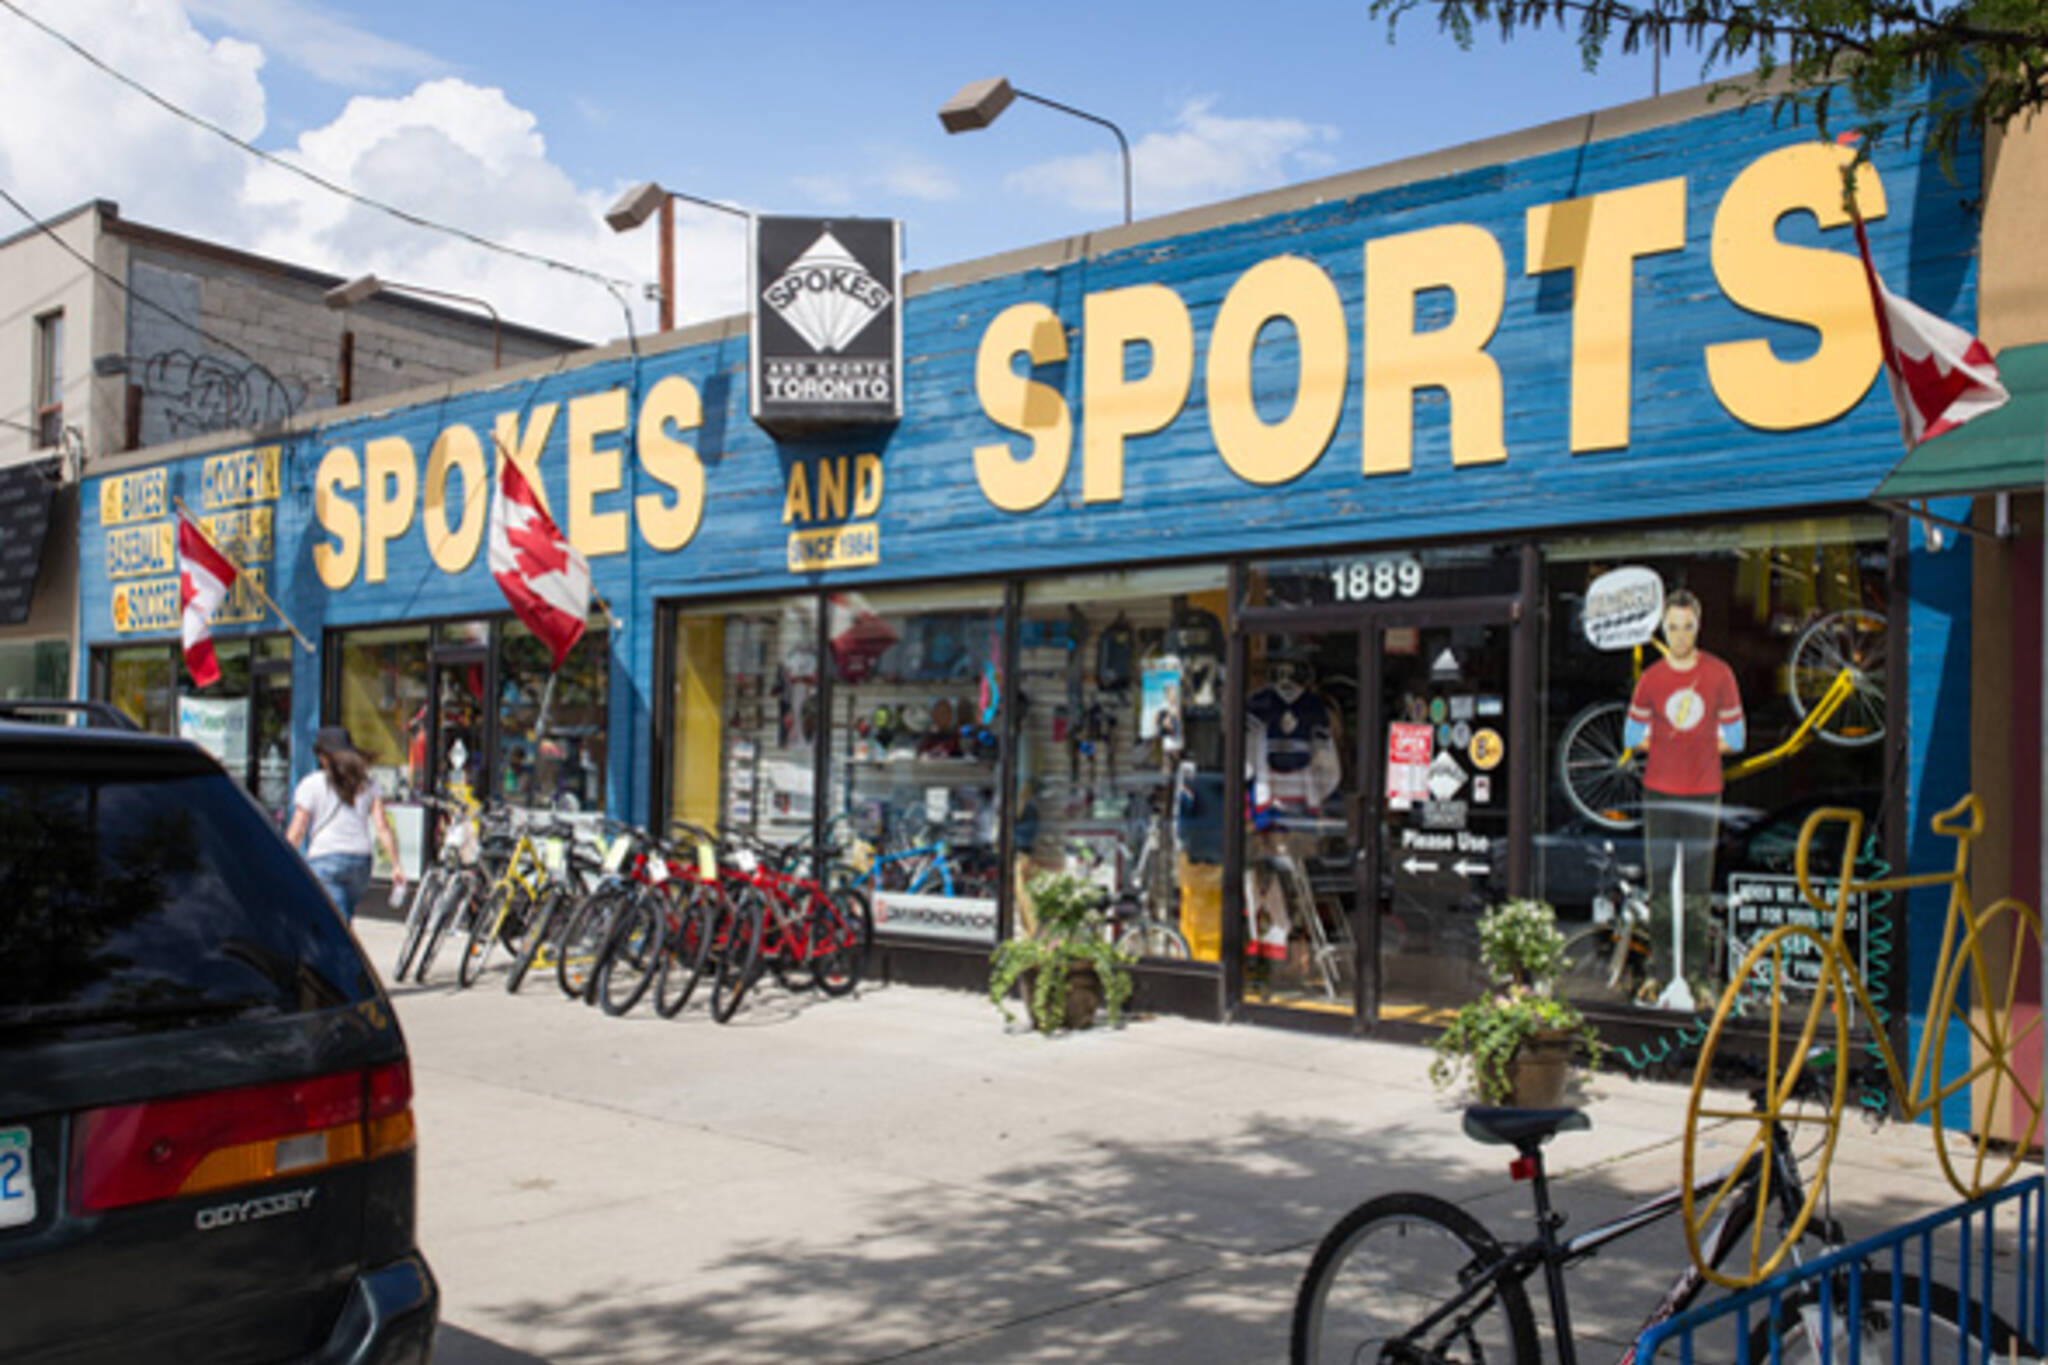 Spokes and Sports Toronto